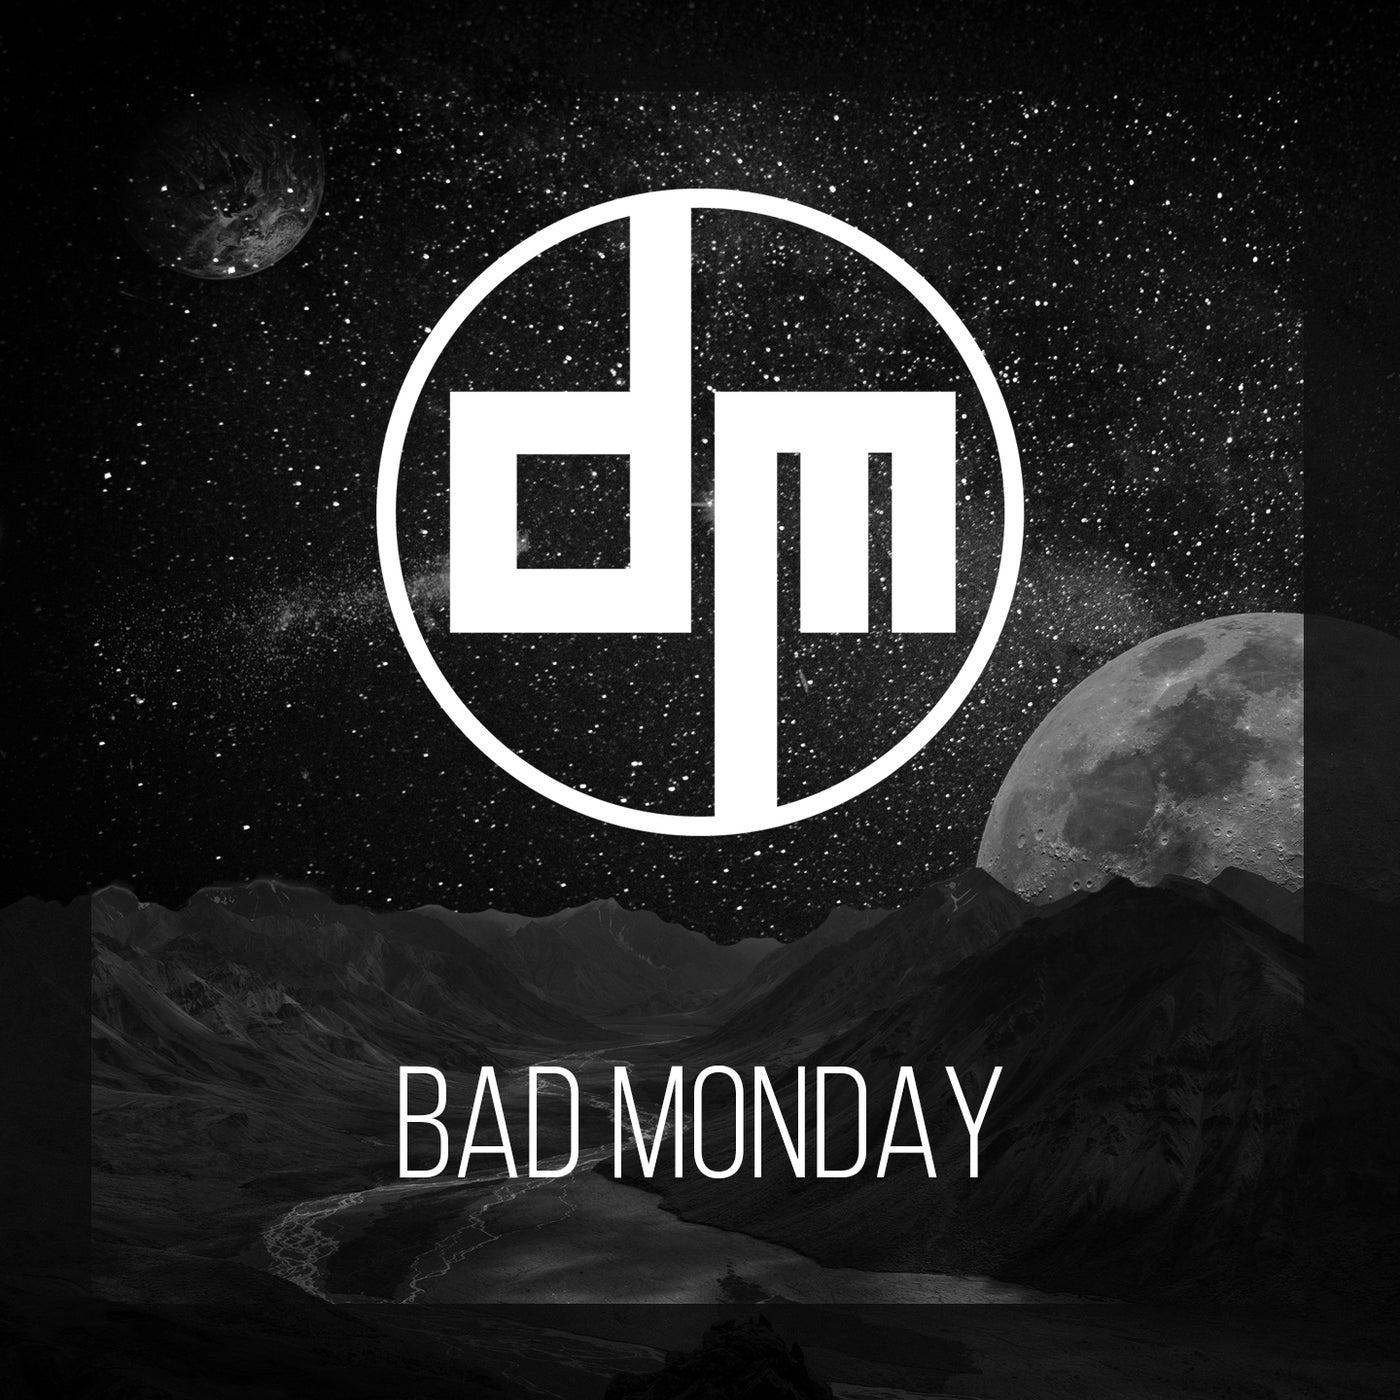 Bad Monday (Original Mix)